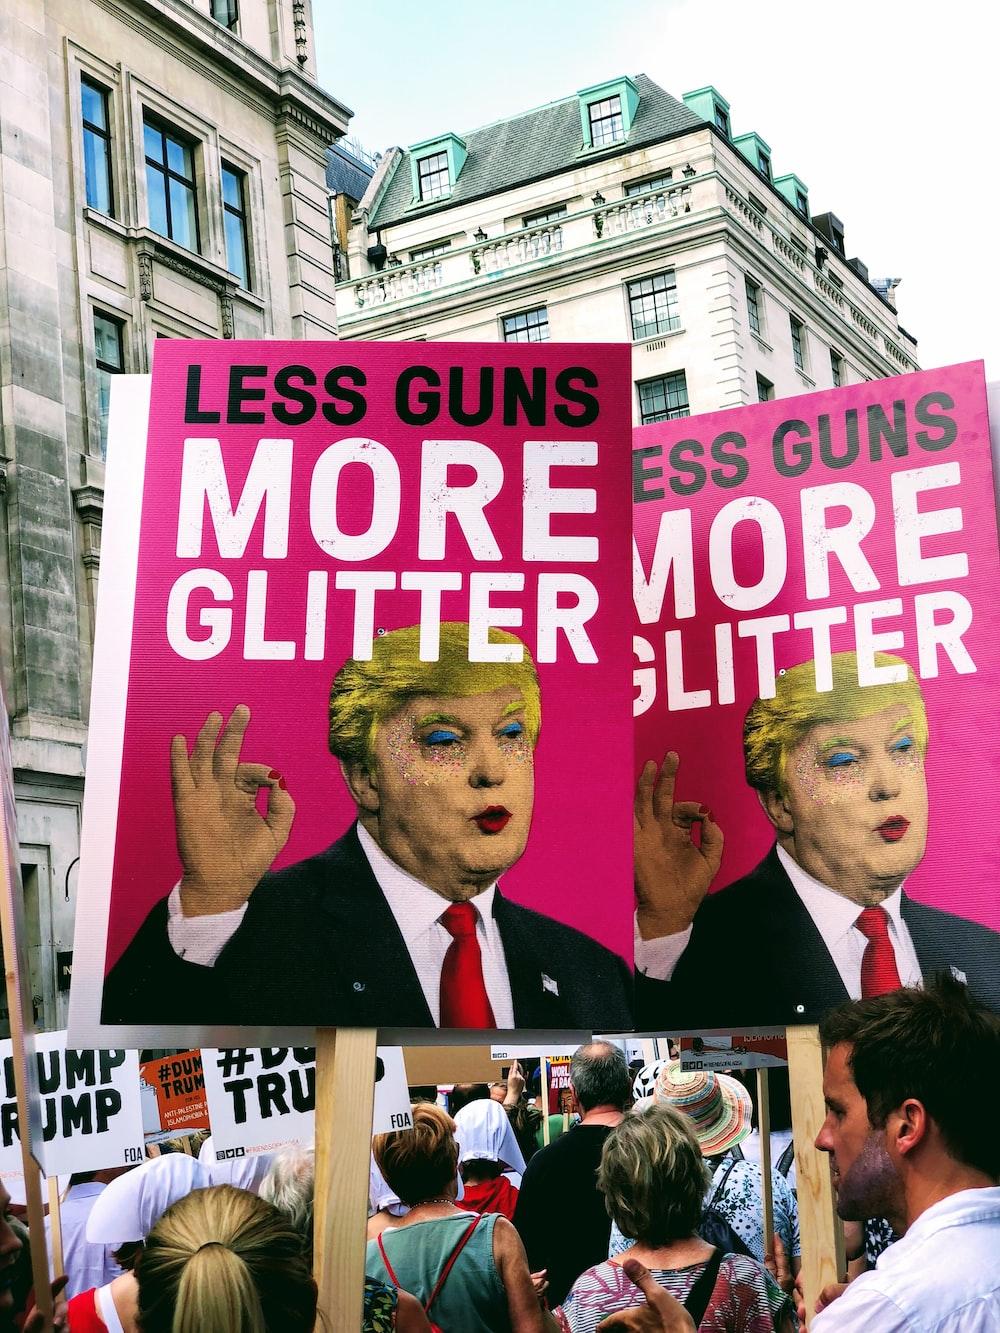 Less Guns More Glitter poster